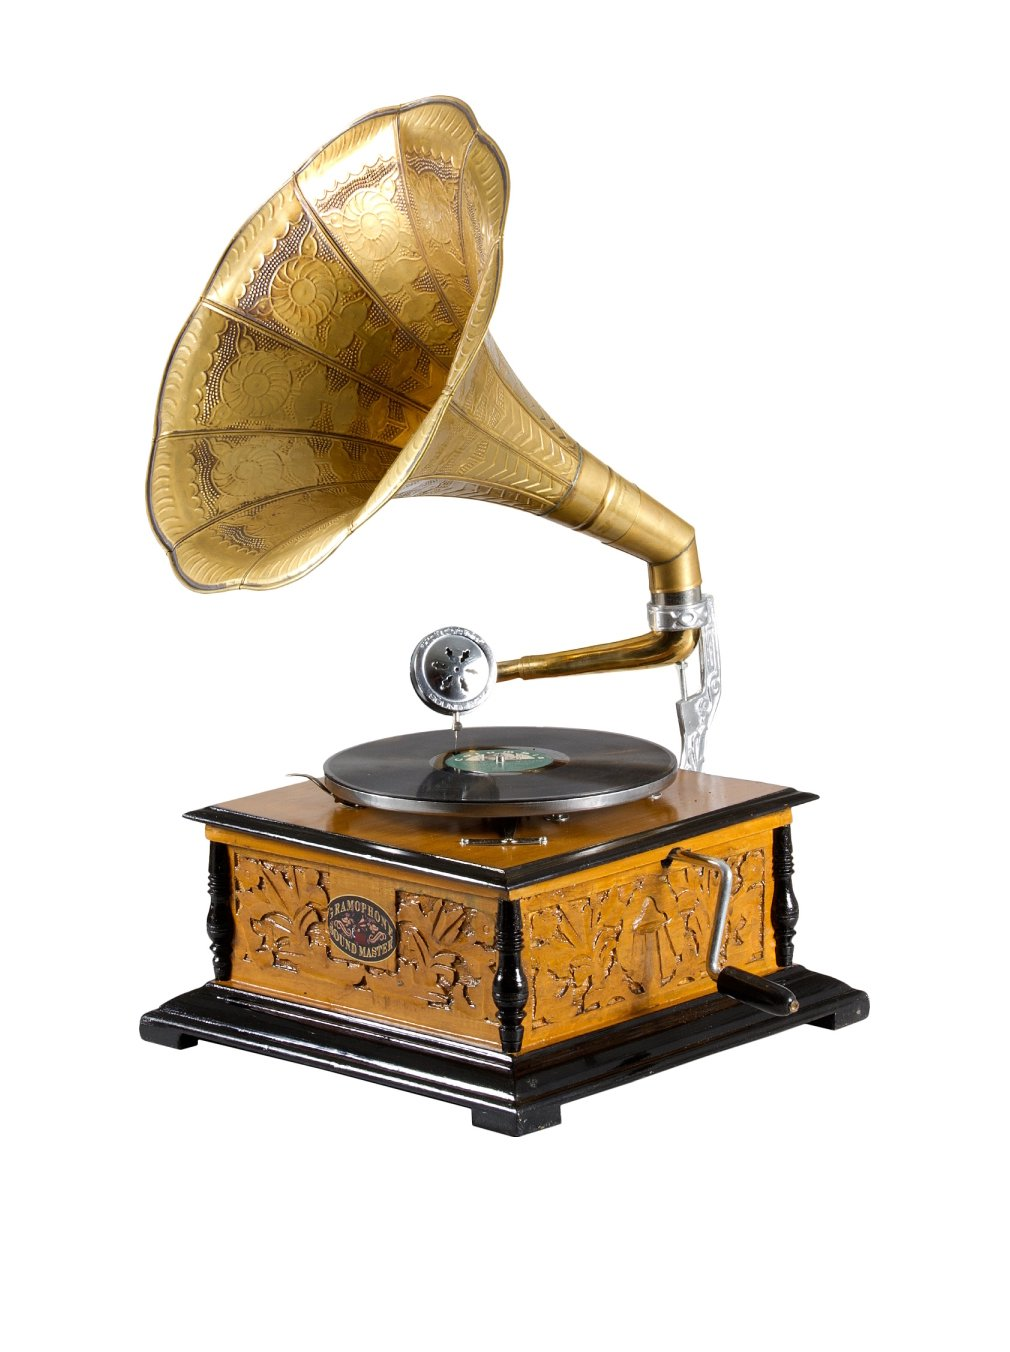 TUTTAMBI Elemento Decorativo Gramophone 17222_marrónydorado